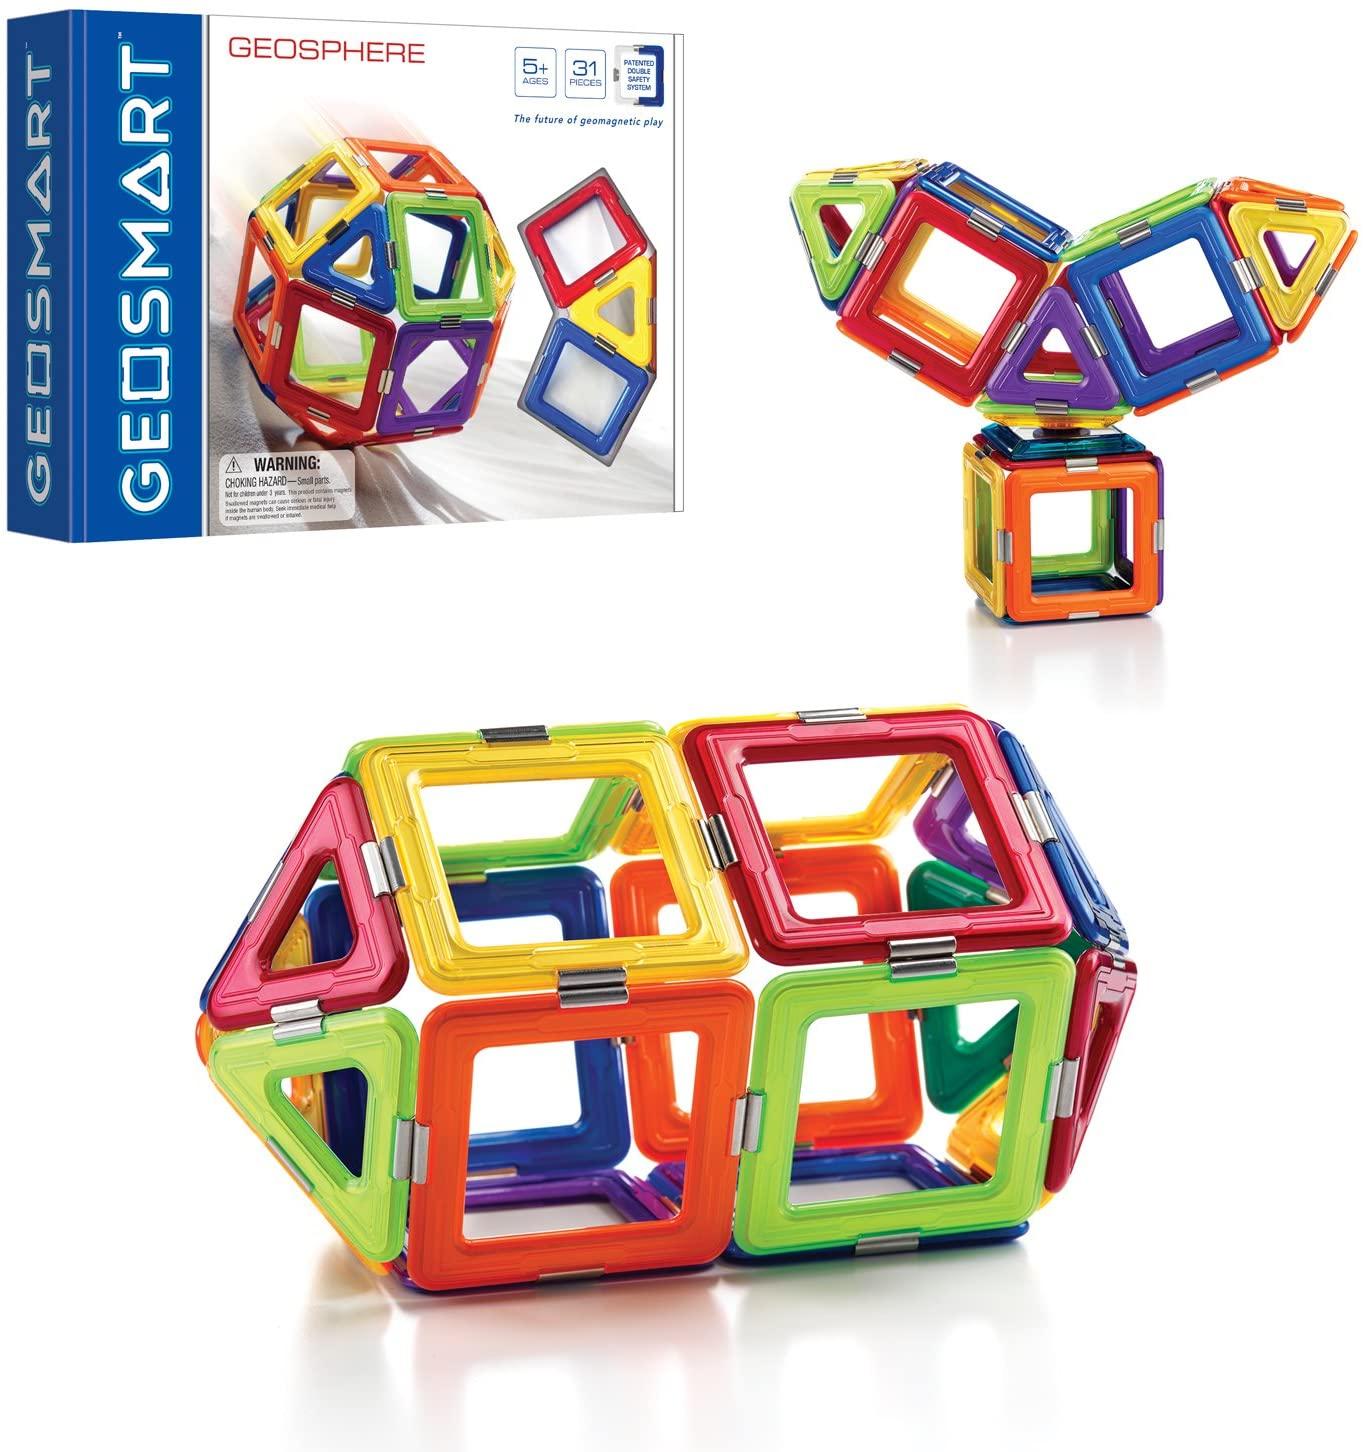 GeoSmart GeoSphere 31-Piece GeoMagnetic STEM Building Set with Spinner